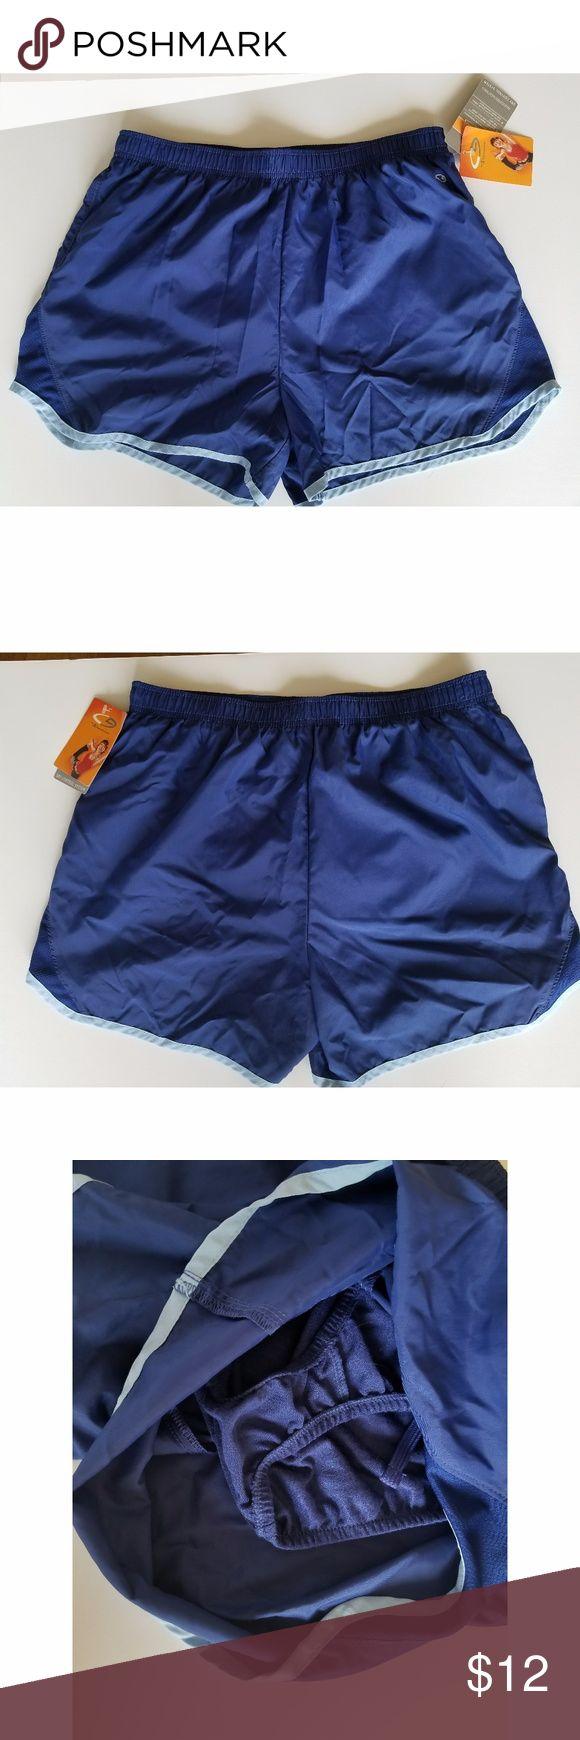 Selling this Champion Running Shorts on Poshmark! My username is: uptownbella. #shopmycloset #poshmark #fashion #shopping #style #forsale #Champion #Pants